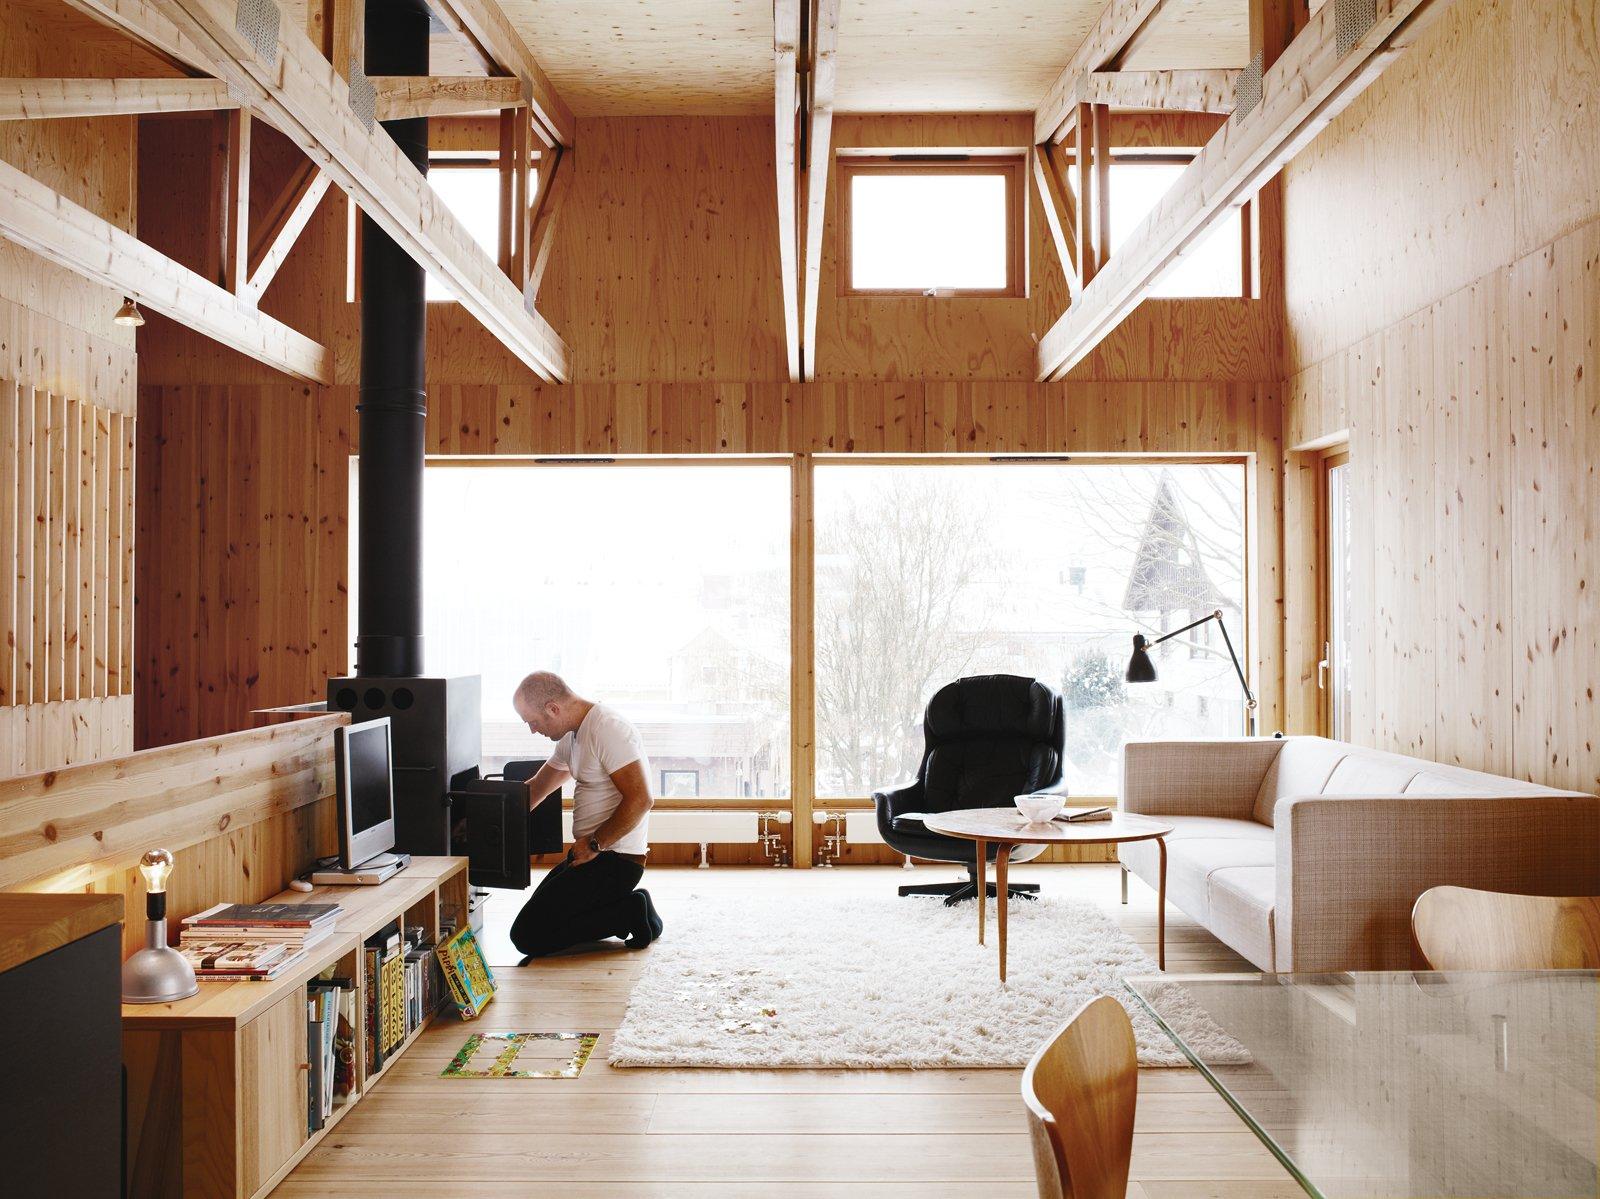 Photo 1 of 11 in 10 Warm Wood Floors